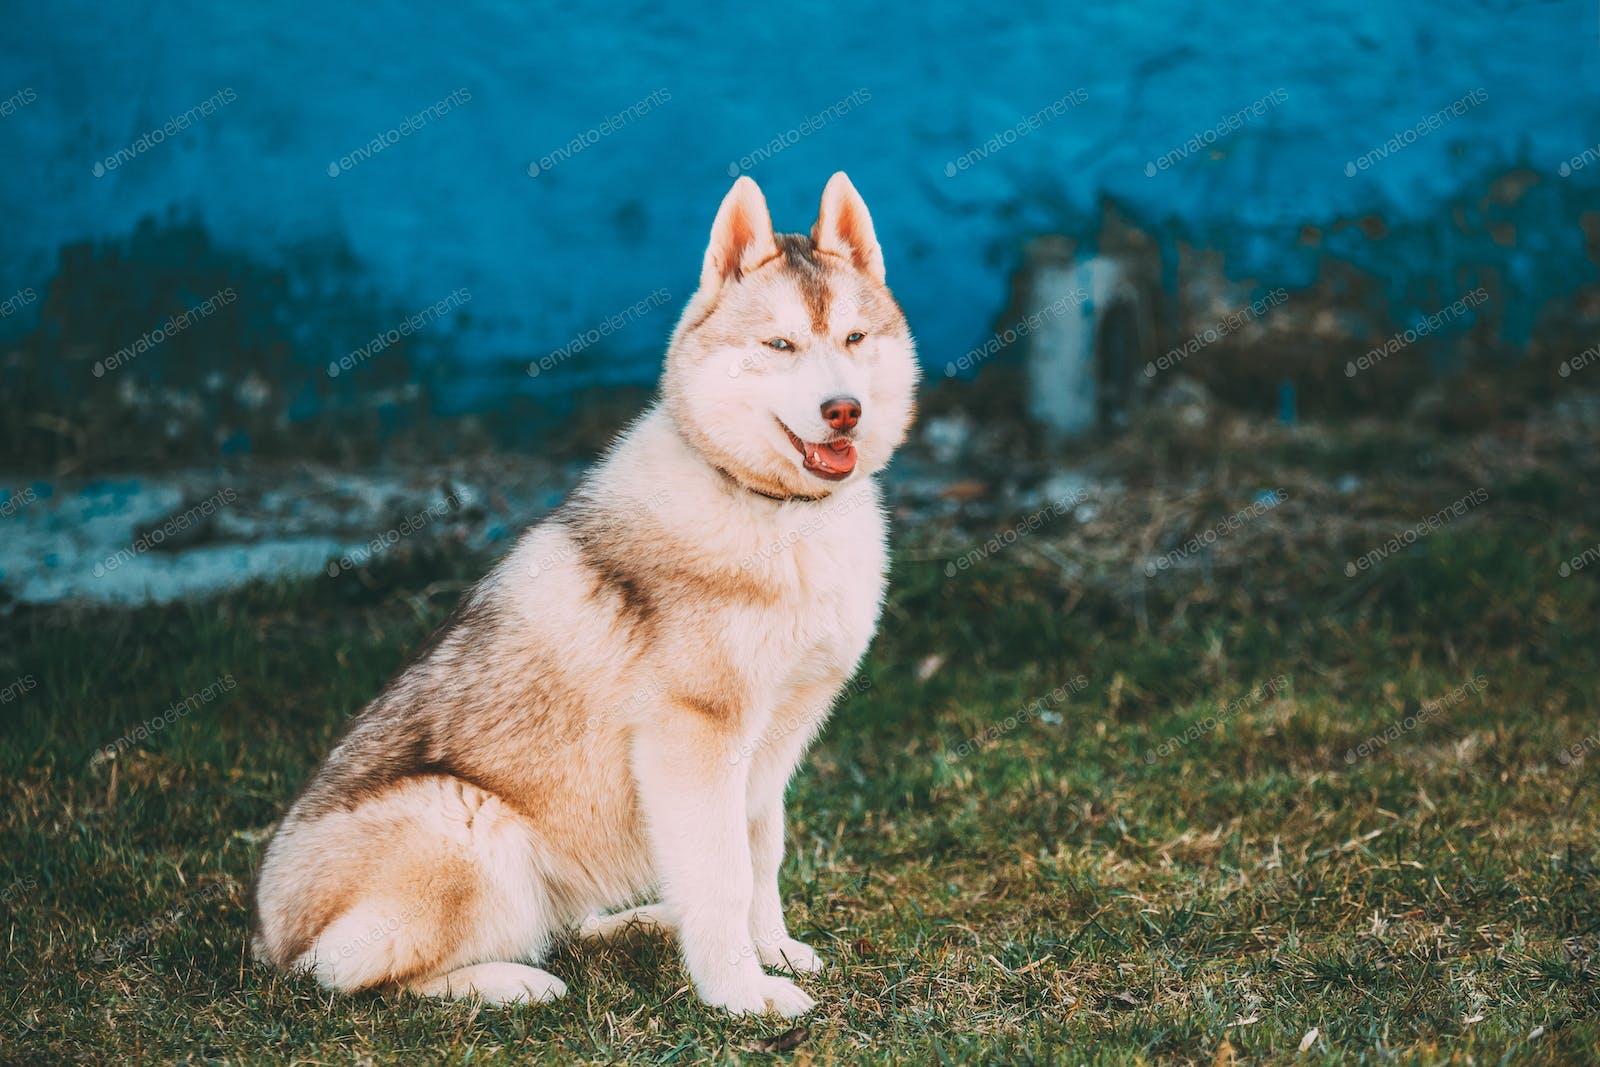 White Husky Puppy Dog With Blue Eyes